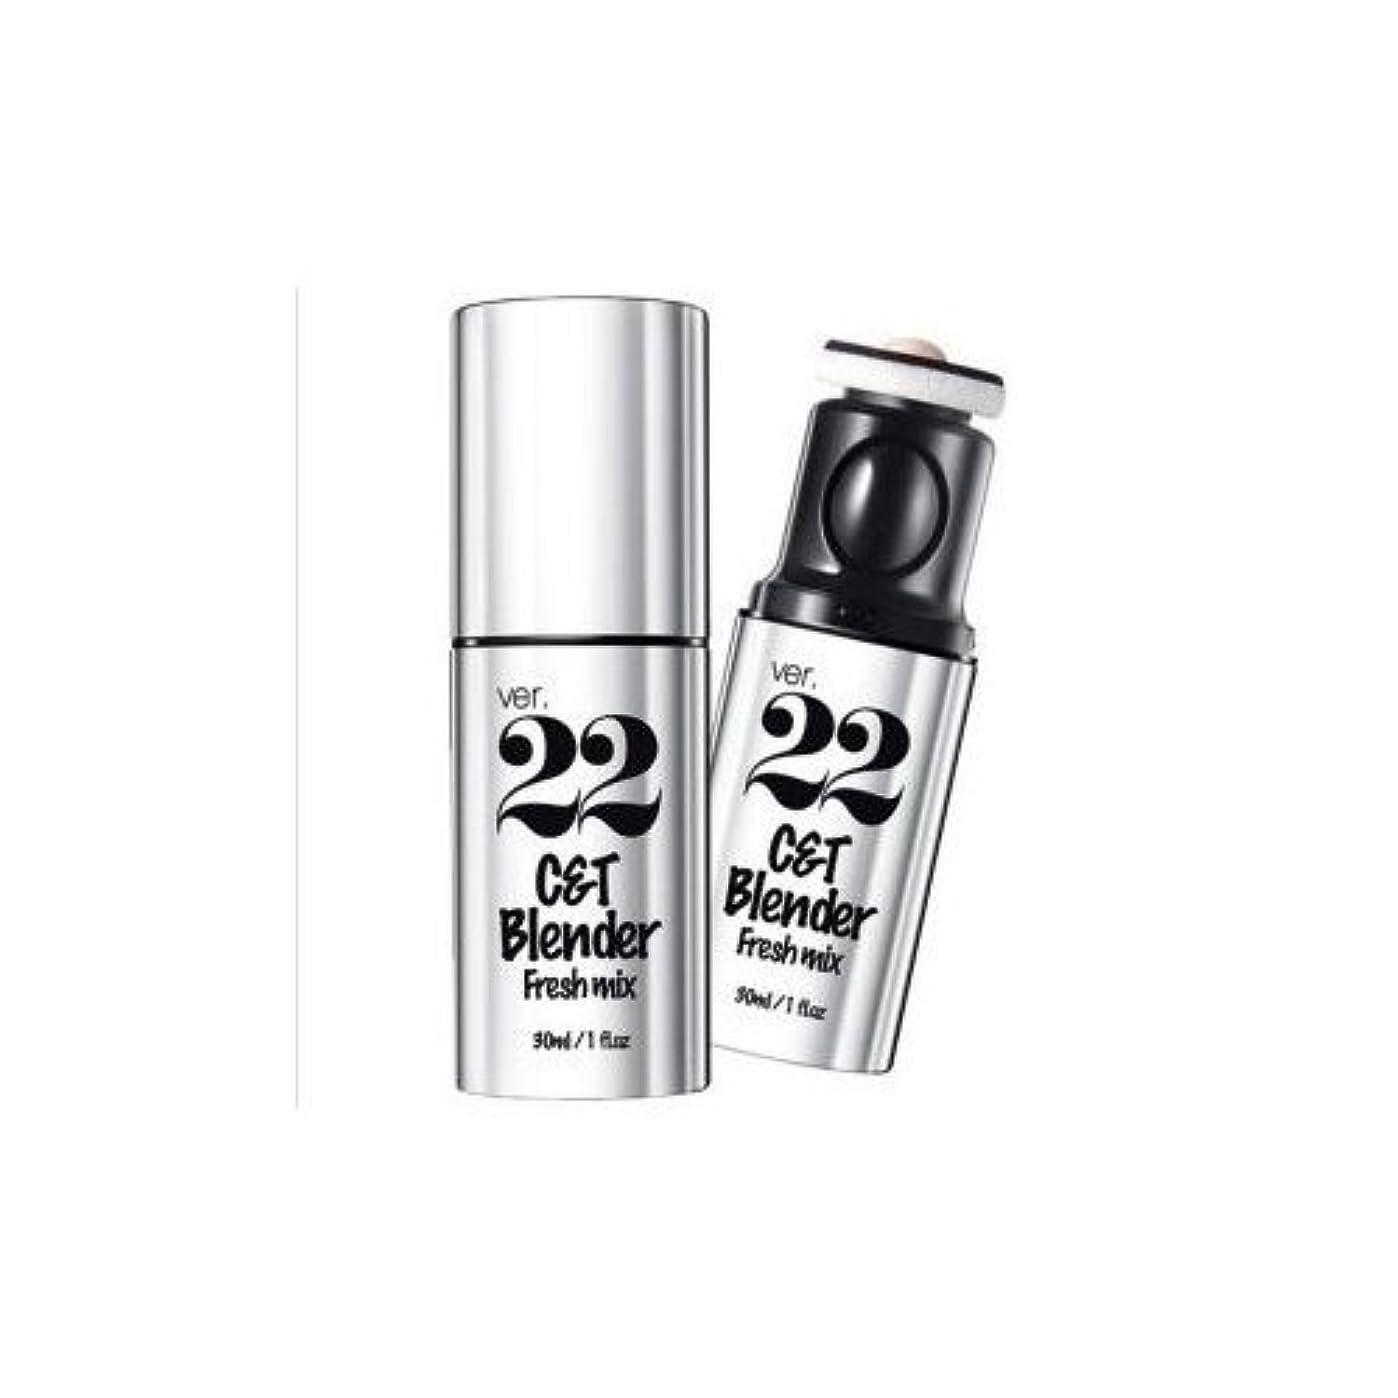 委託不道徳週末chosungah22 C&T Blender Fresh Mix 30ml, Capsule Foundation, #01, Korean Cosmetics